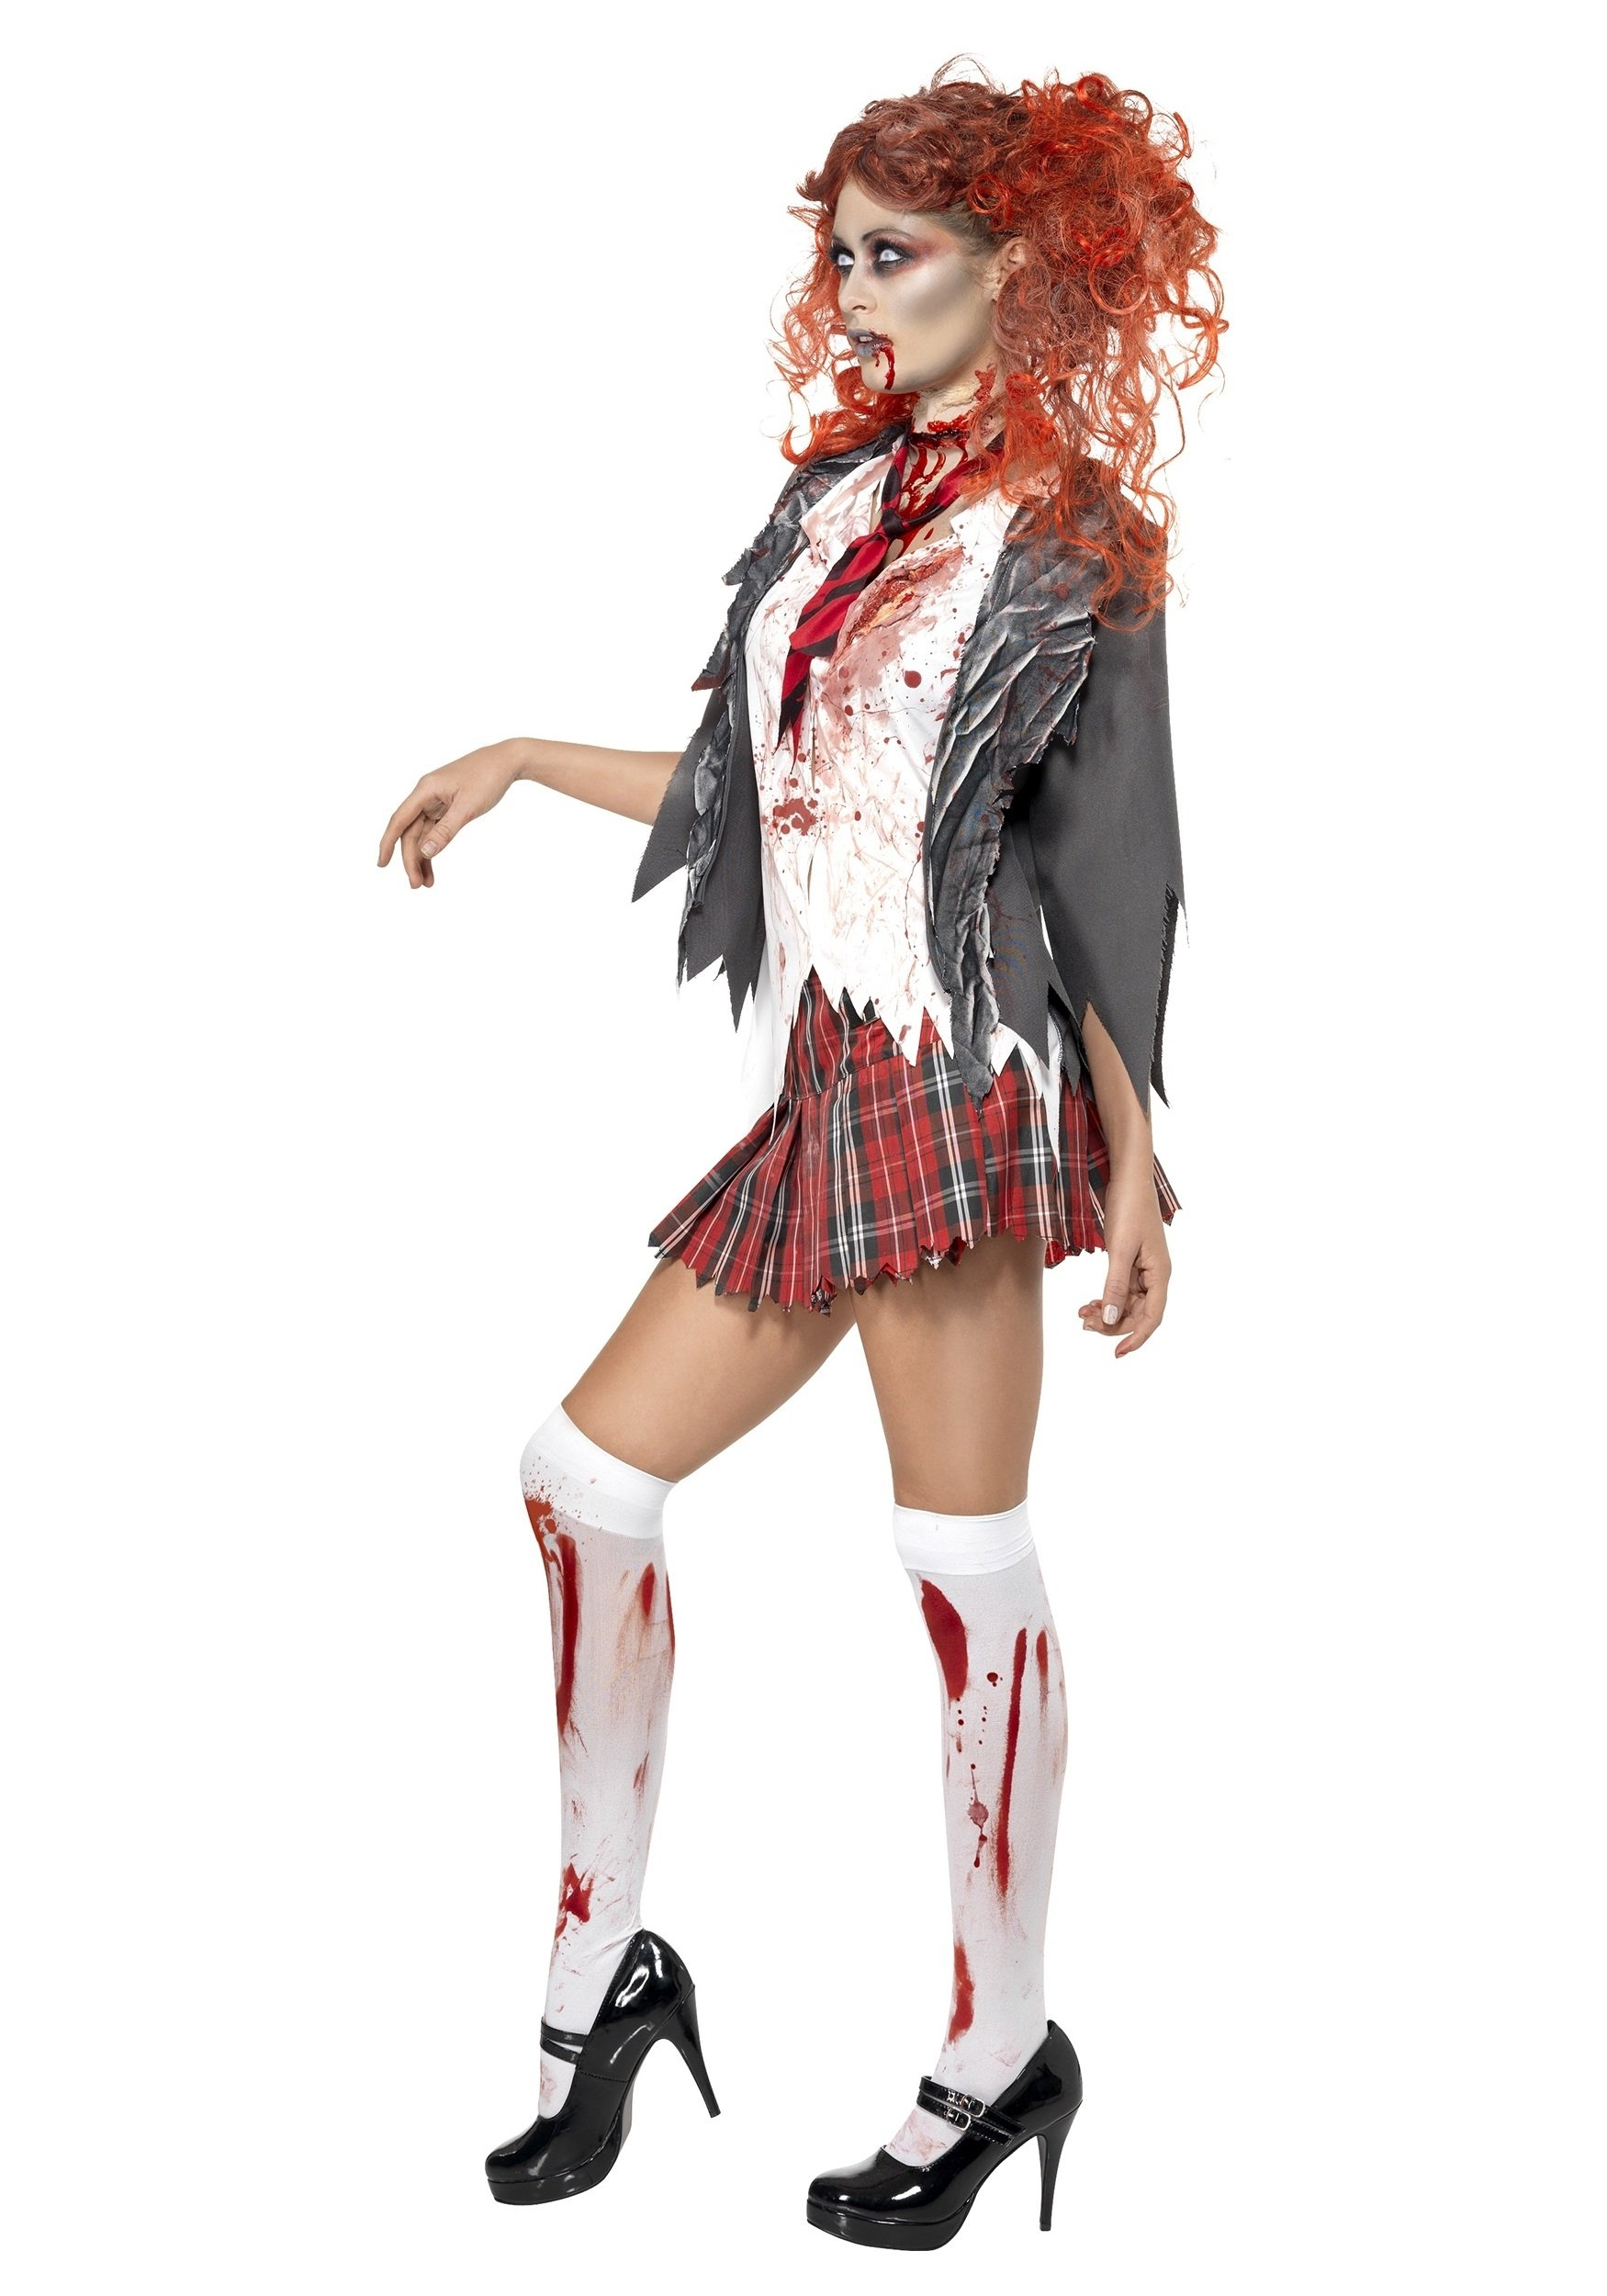 10 Ideal High School Halloween Costume Ideas school girl zombie costume